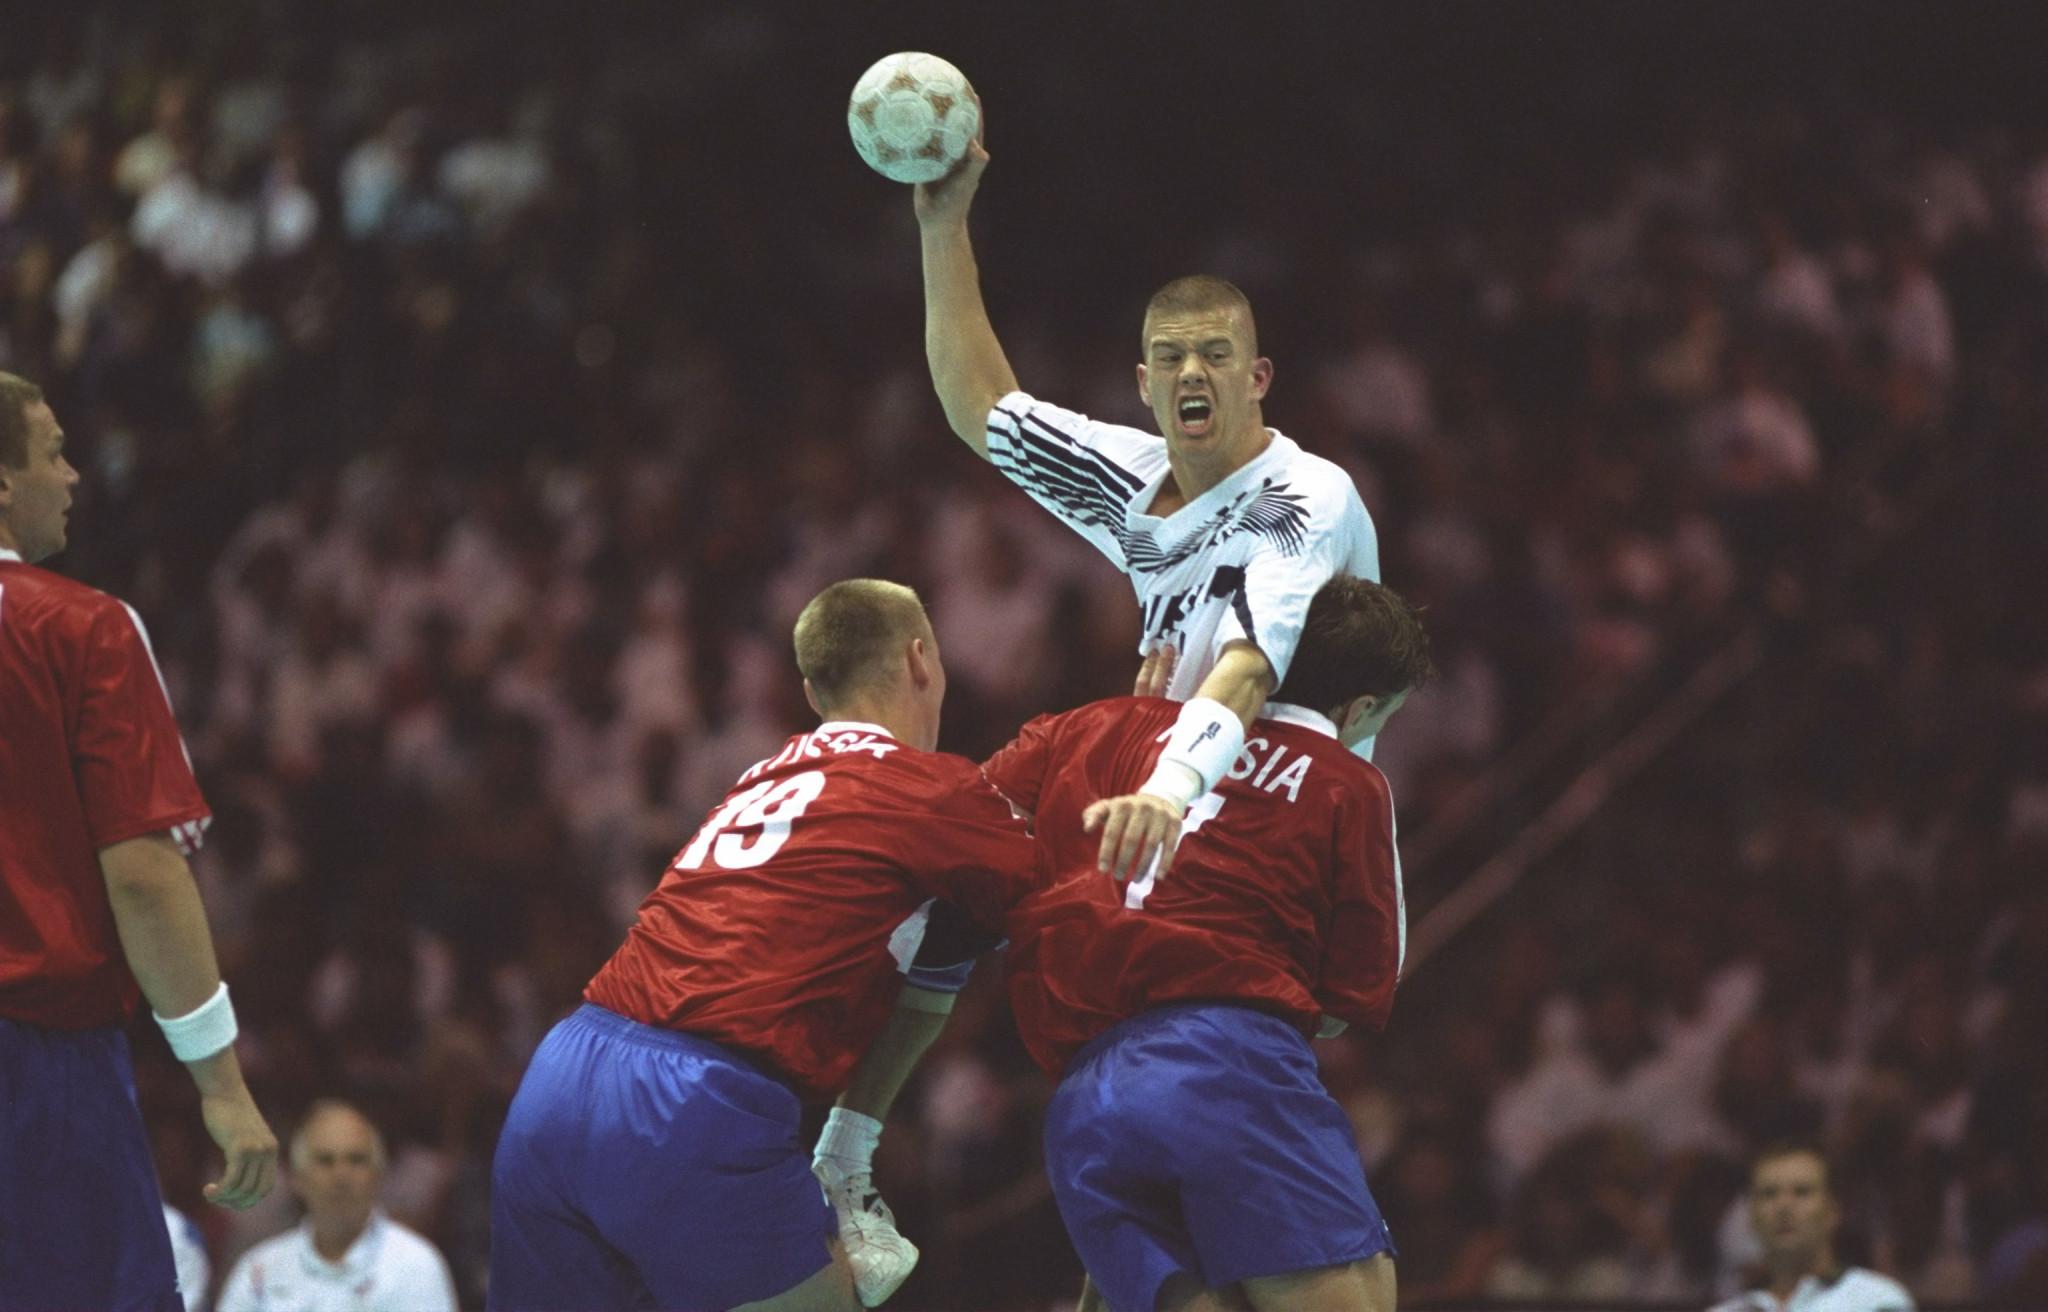 United States handball teams last made an Olympic appearance at Atlanta 1996 ©Getty Images